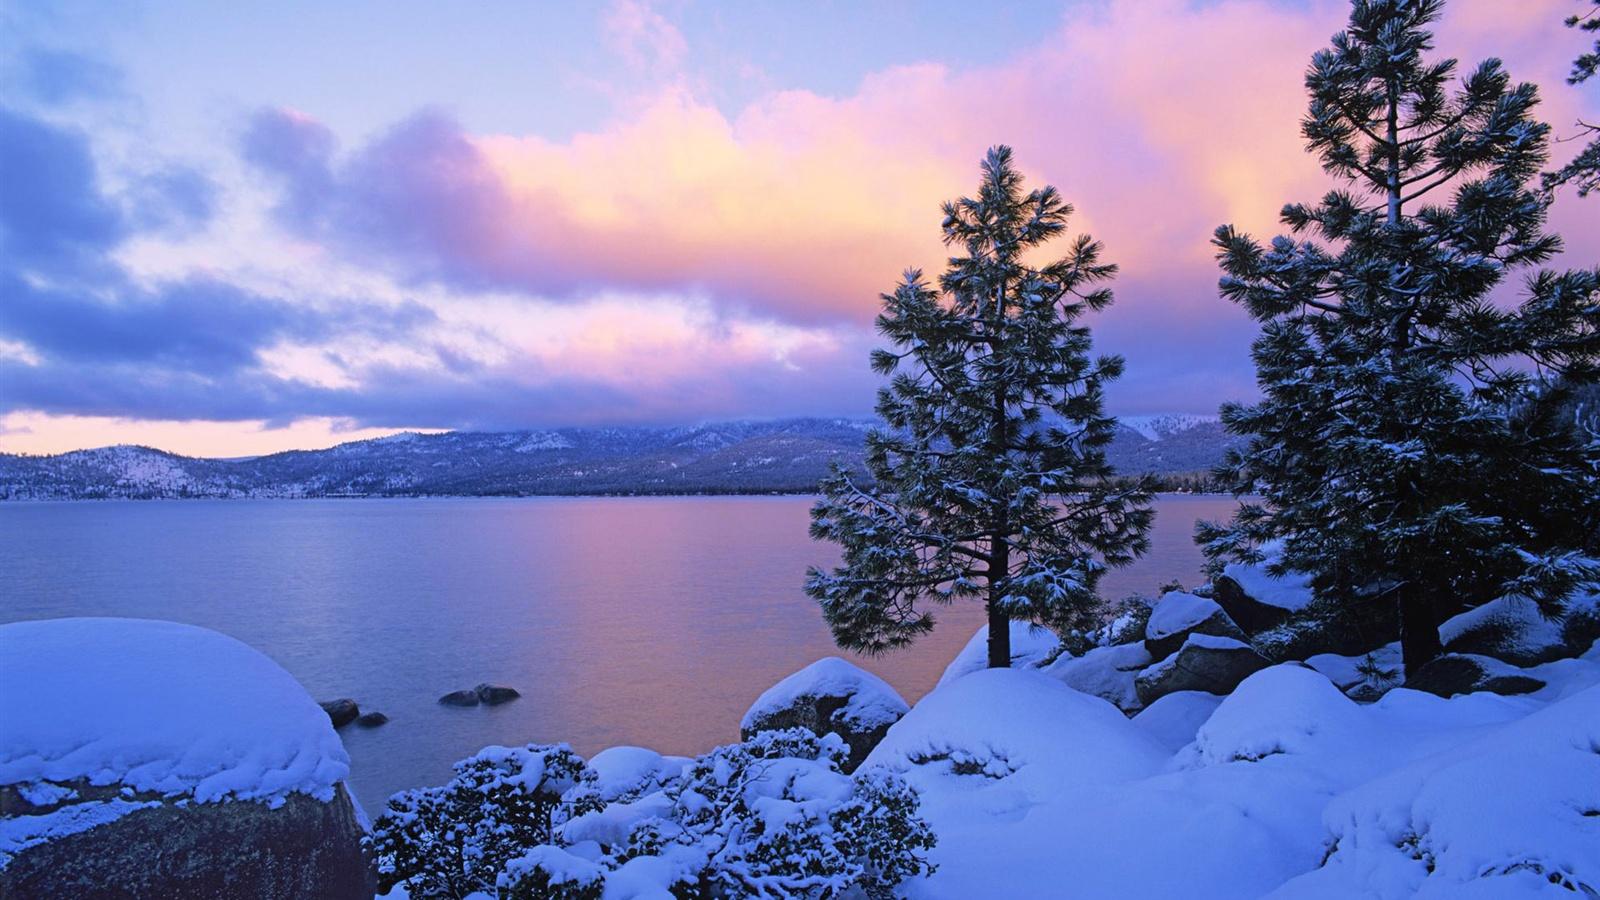 1600x900 hd desktop wallpaper winter - photo #22